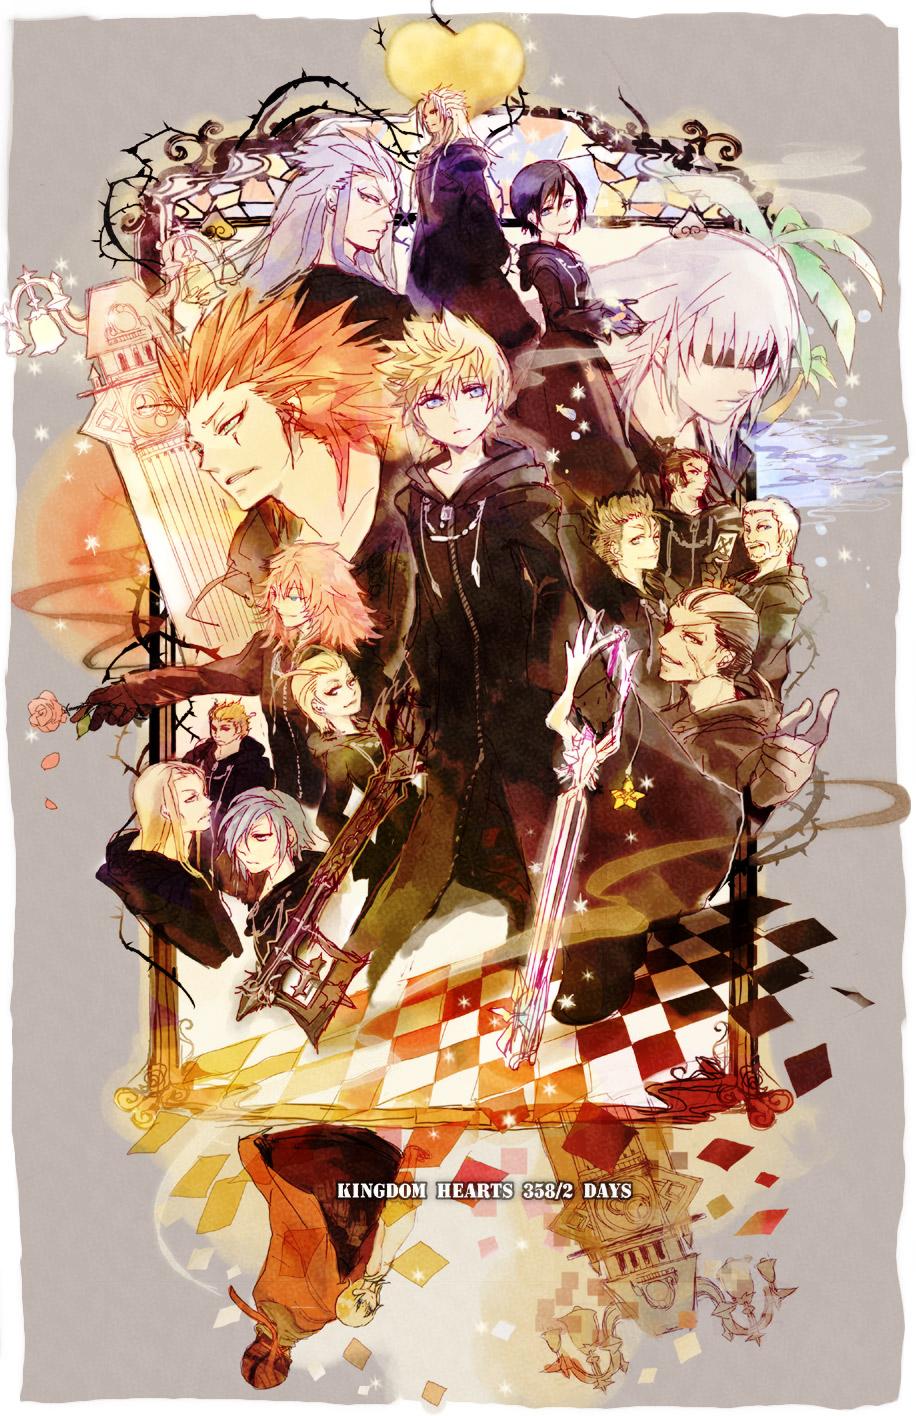 ... / Media File 6 for Kingdom Hearts - 358-2 Days (US)(M2)(XenoPhobia